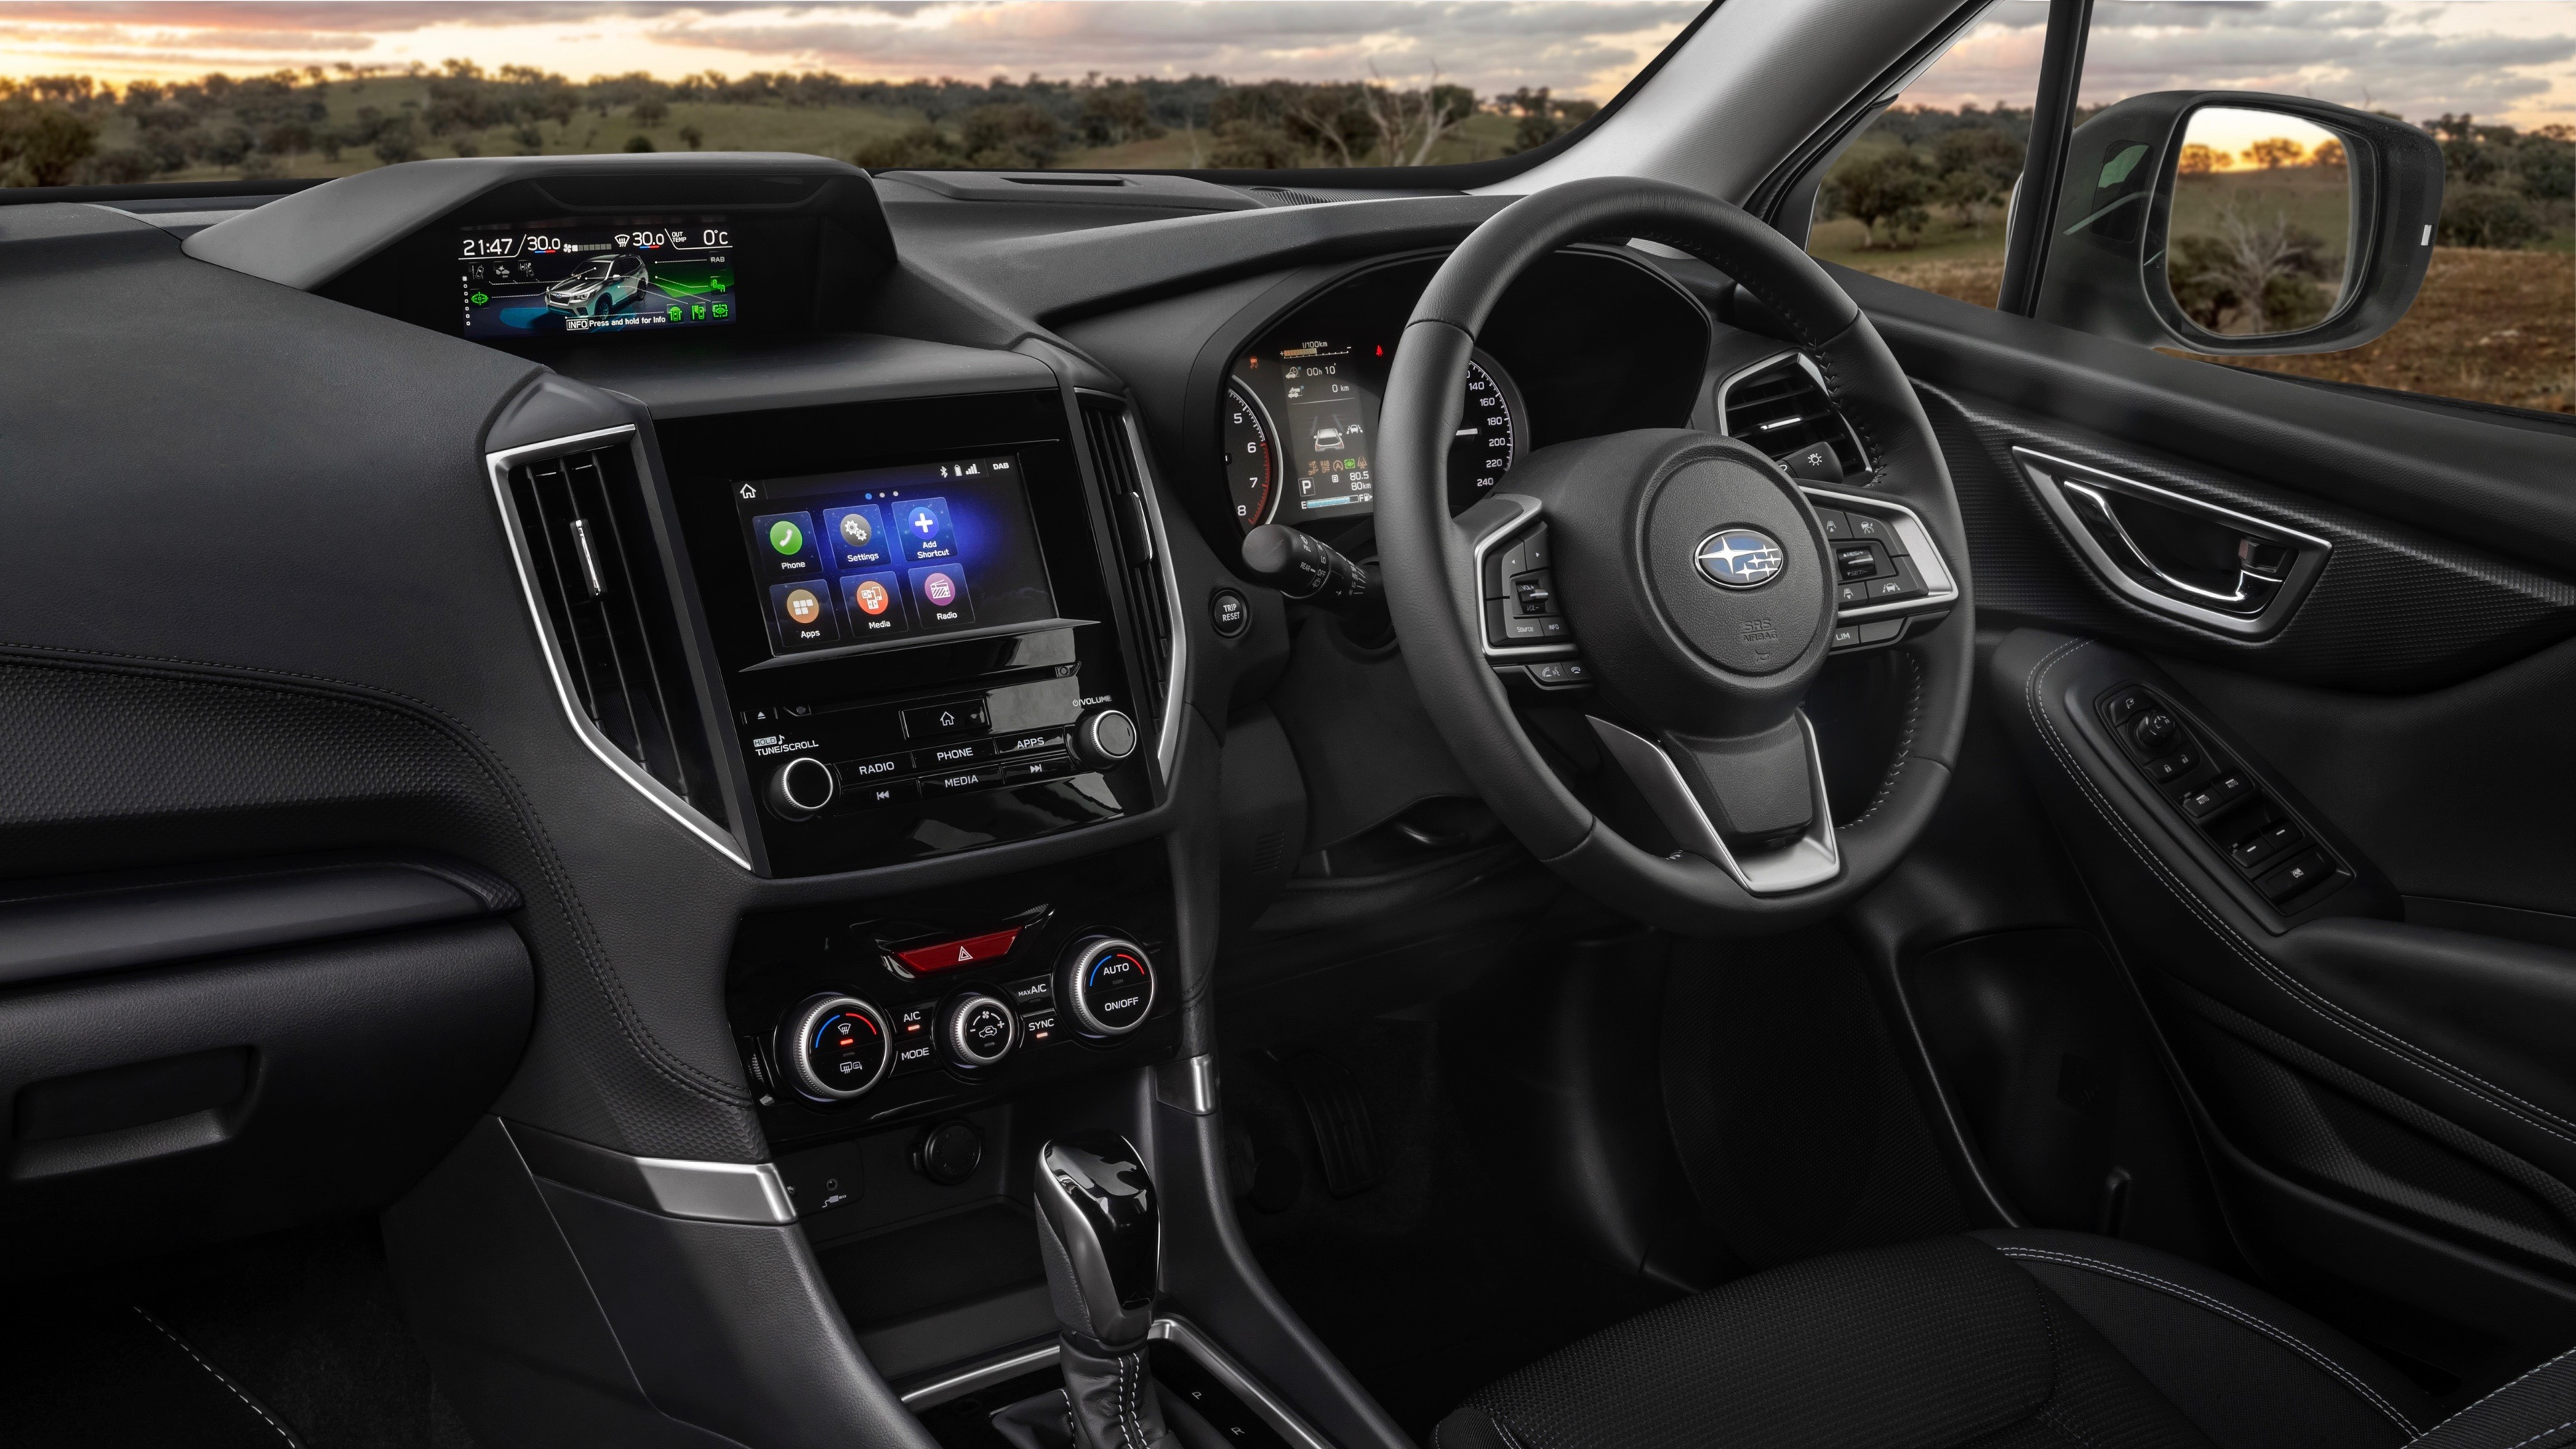 2019 Subaru Forester 2.5i-L dashboard